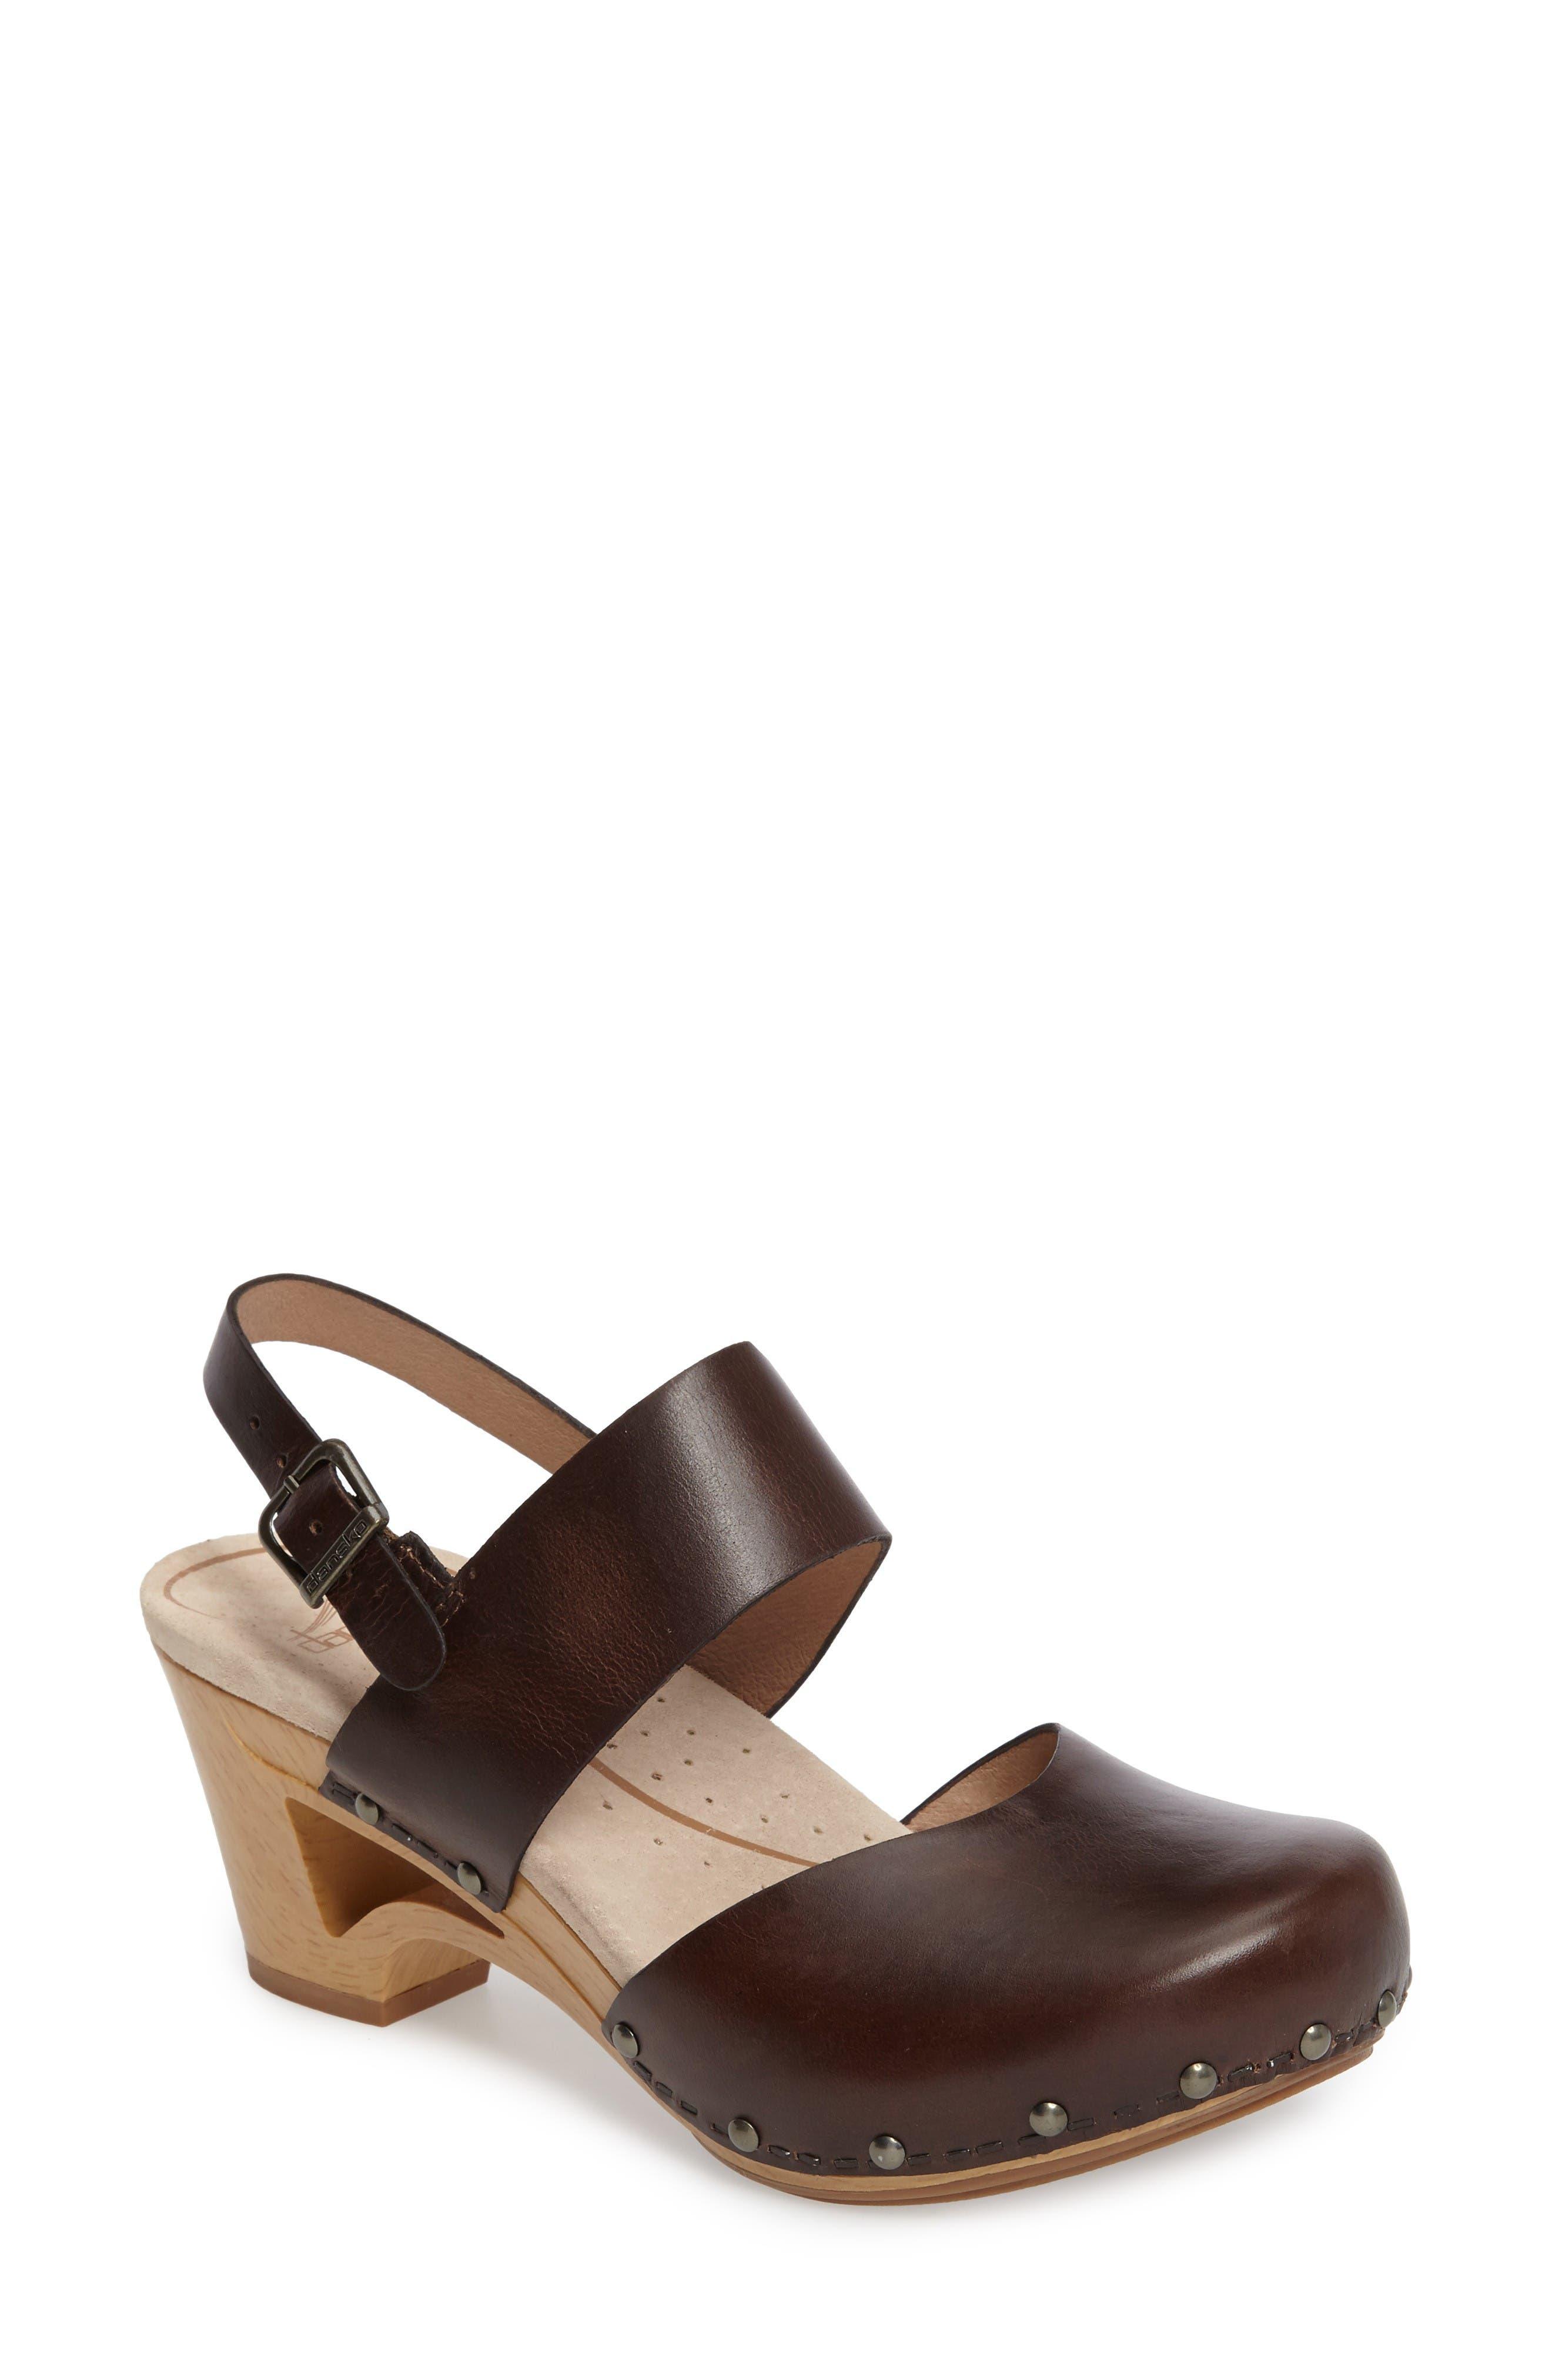 Dansko 'Thea' Sandal